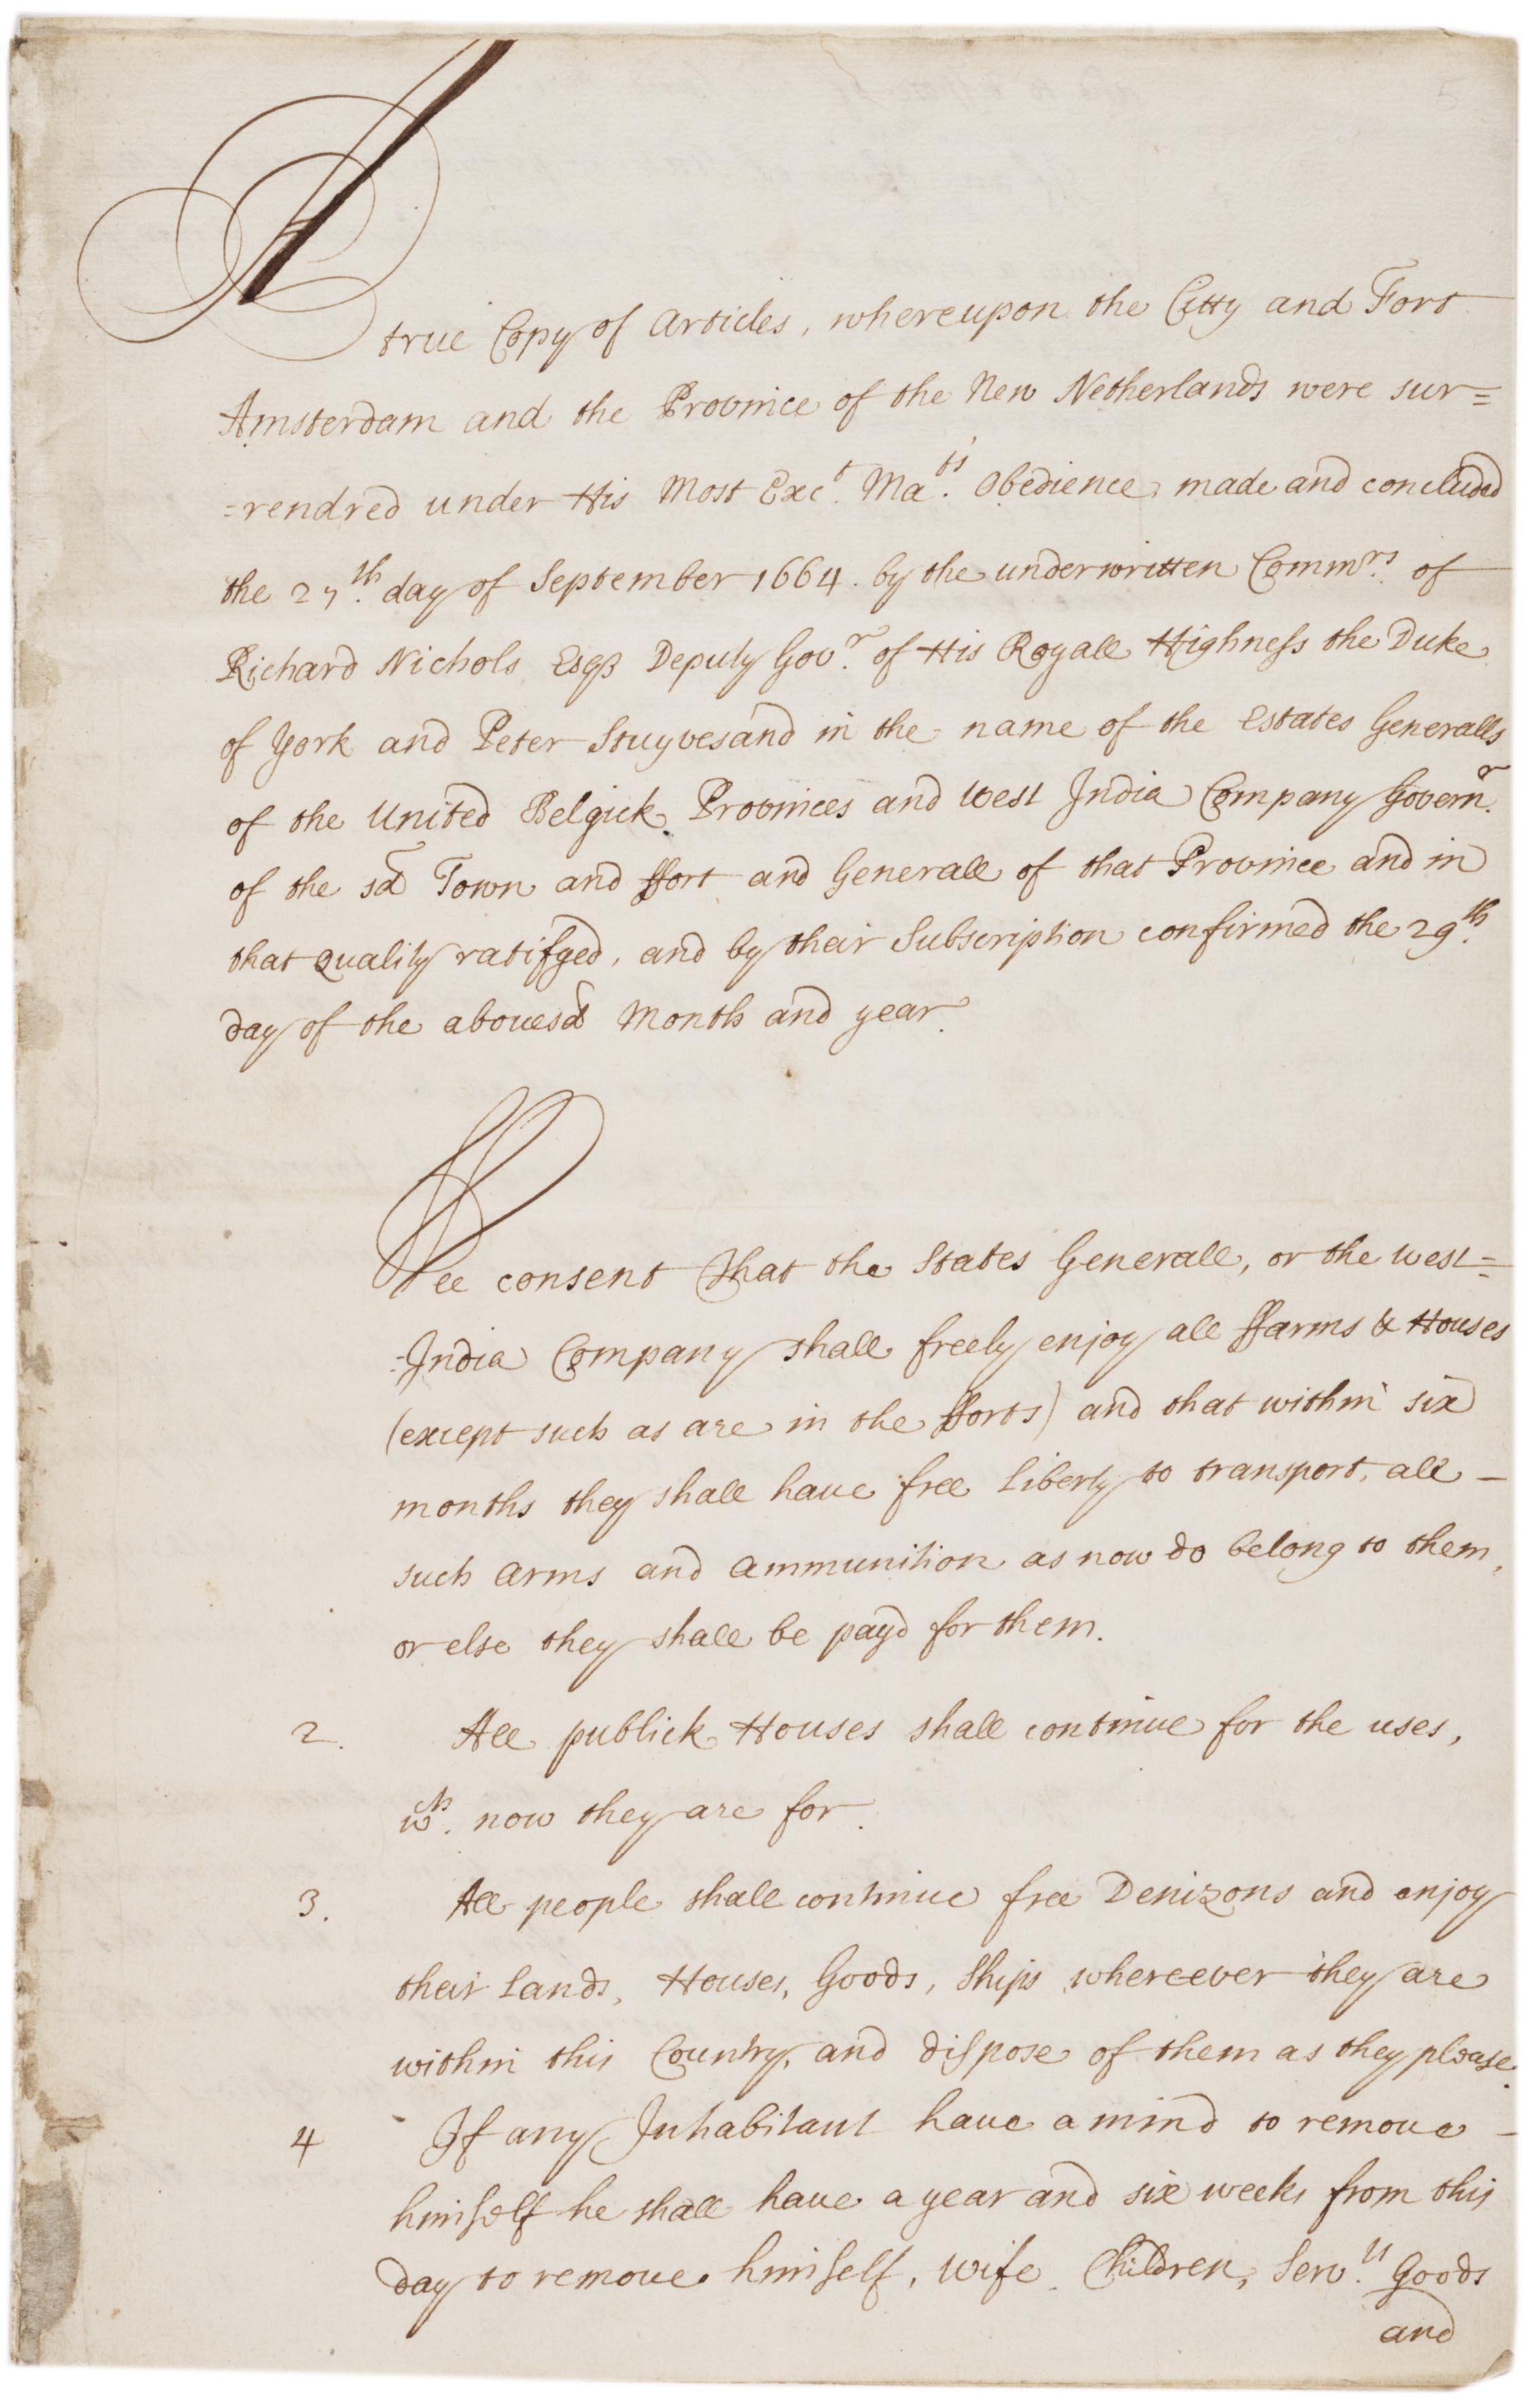 True copy of articles, whereupon ... the New Netherlands were surren